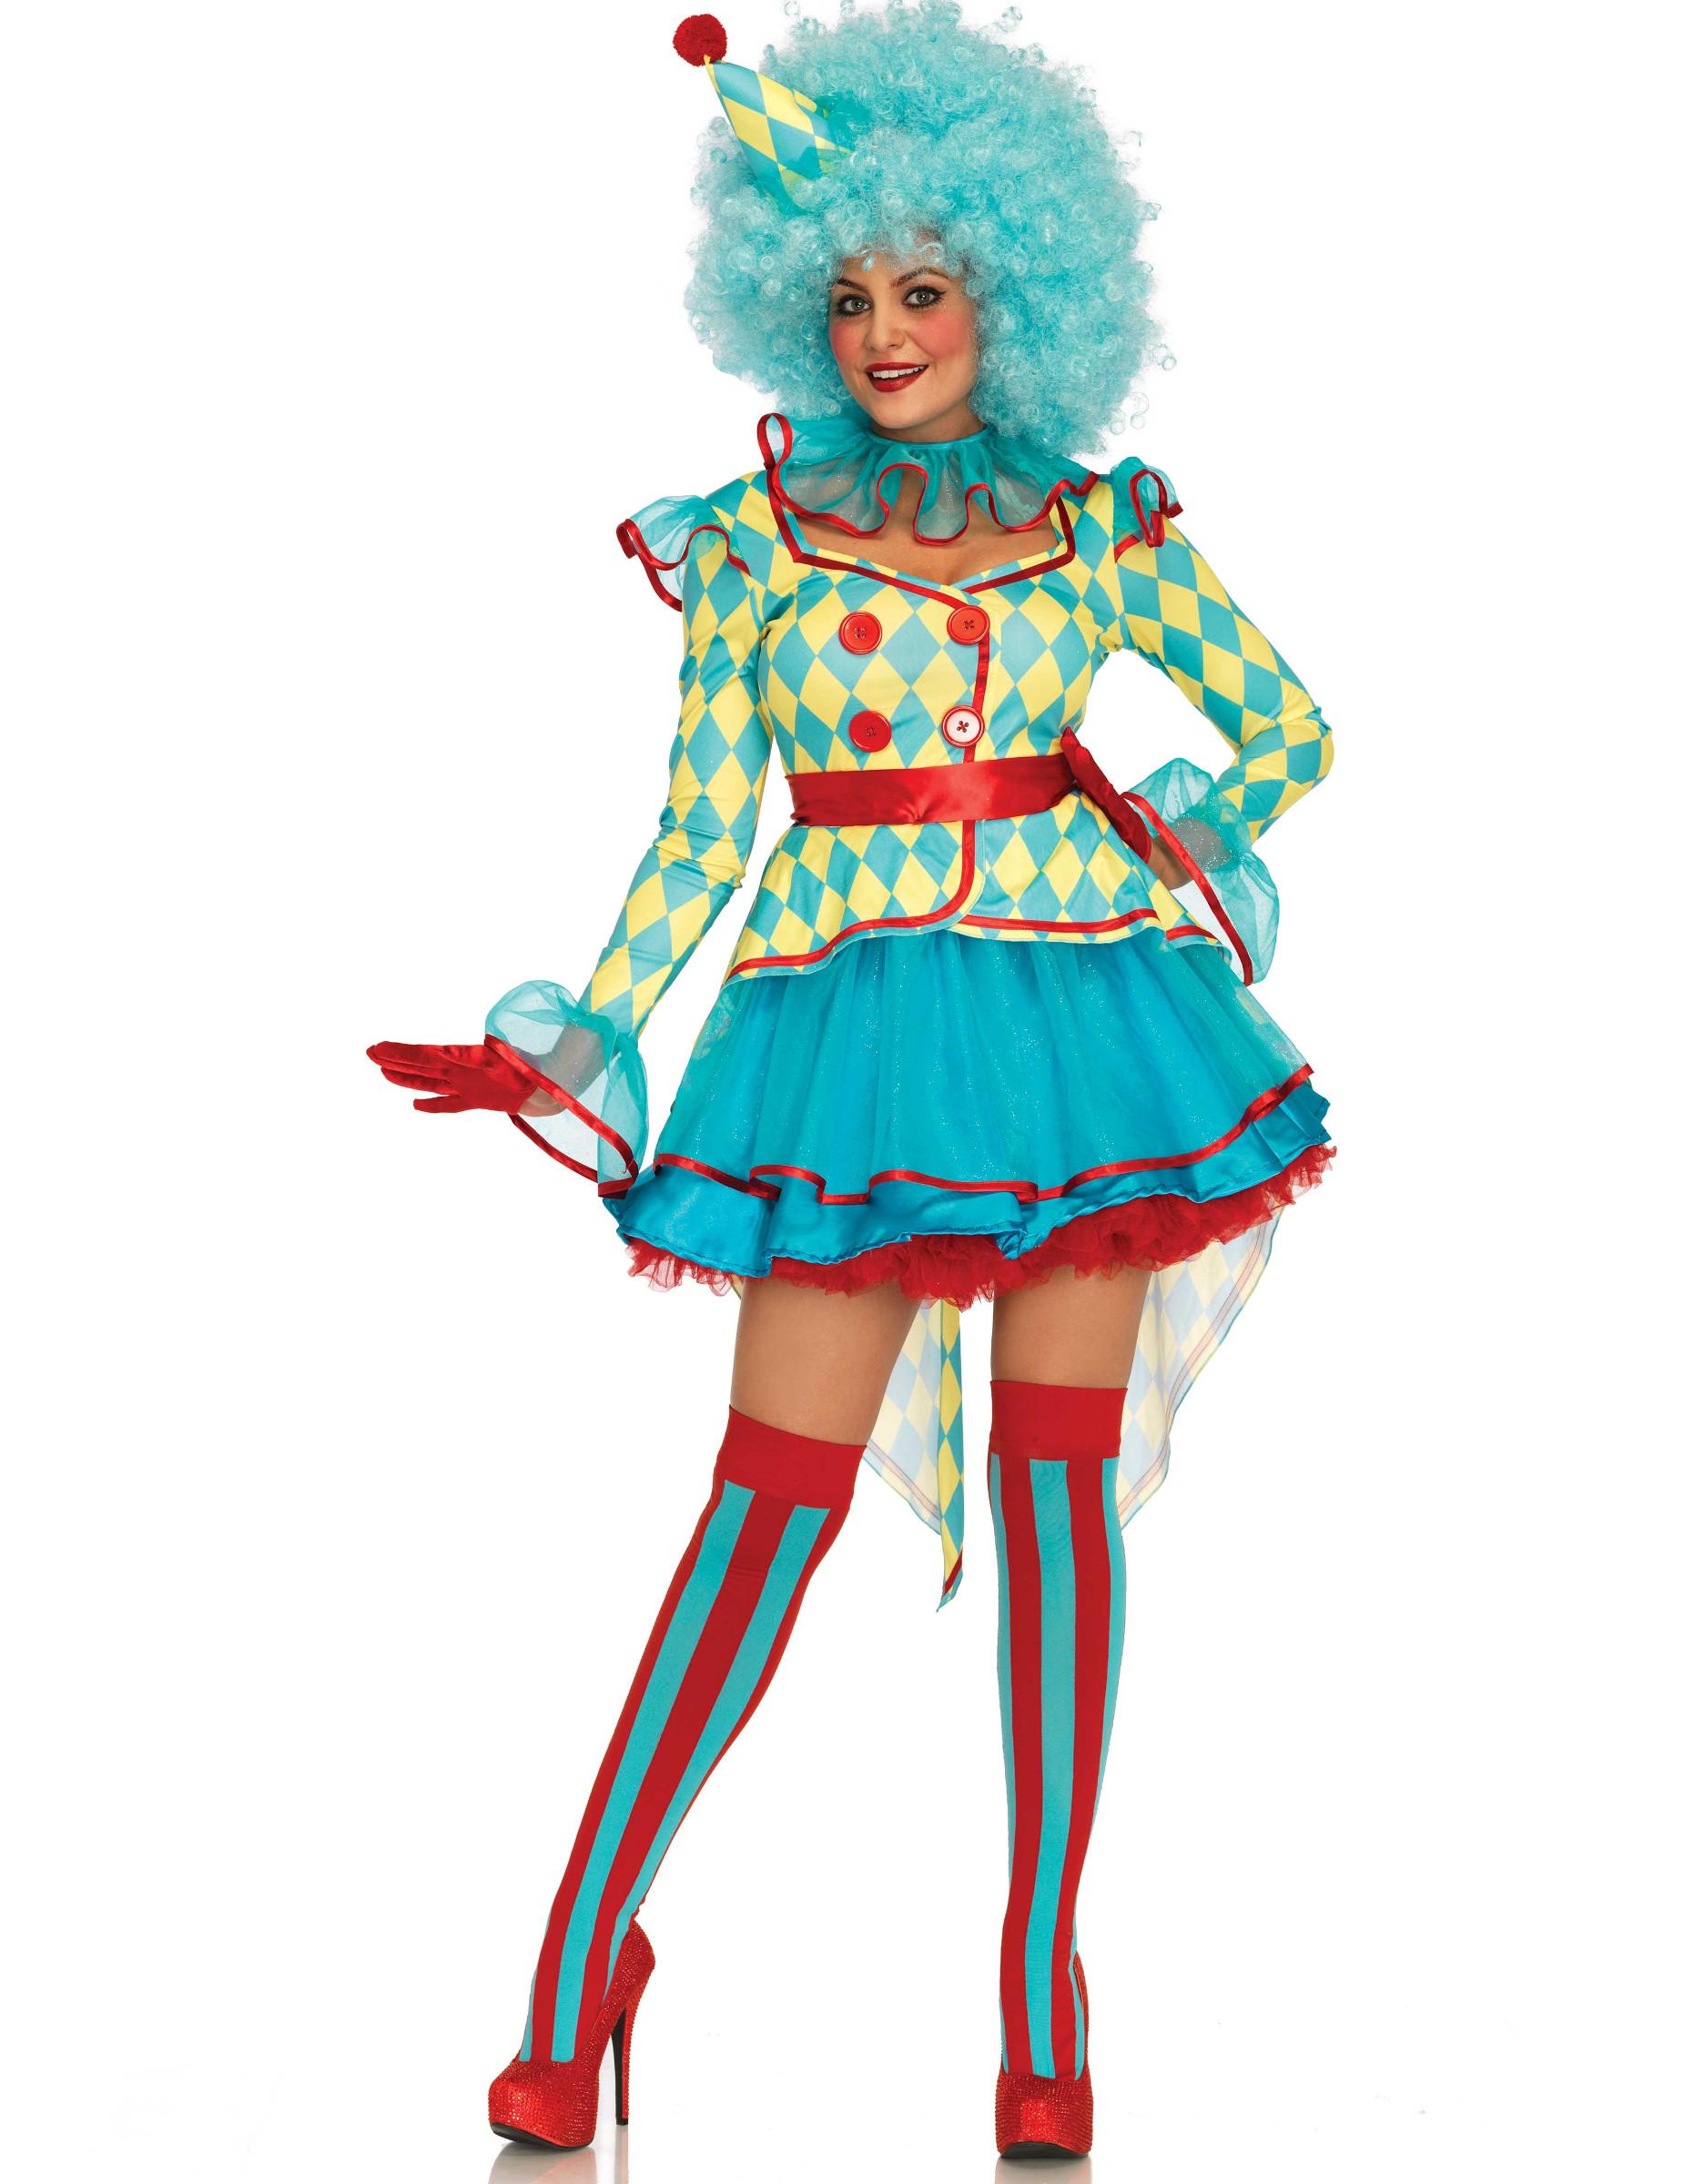 verr ckte clownsfrau kost m f r damen bunt kost me f r erwachsene und g nstige faschingskost me. Black Bedroom Furniture Sets. Home Design Ideas